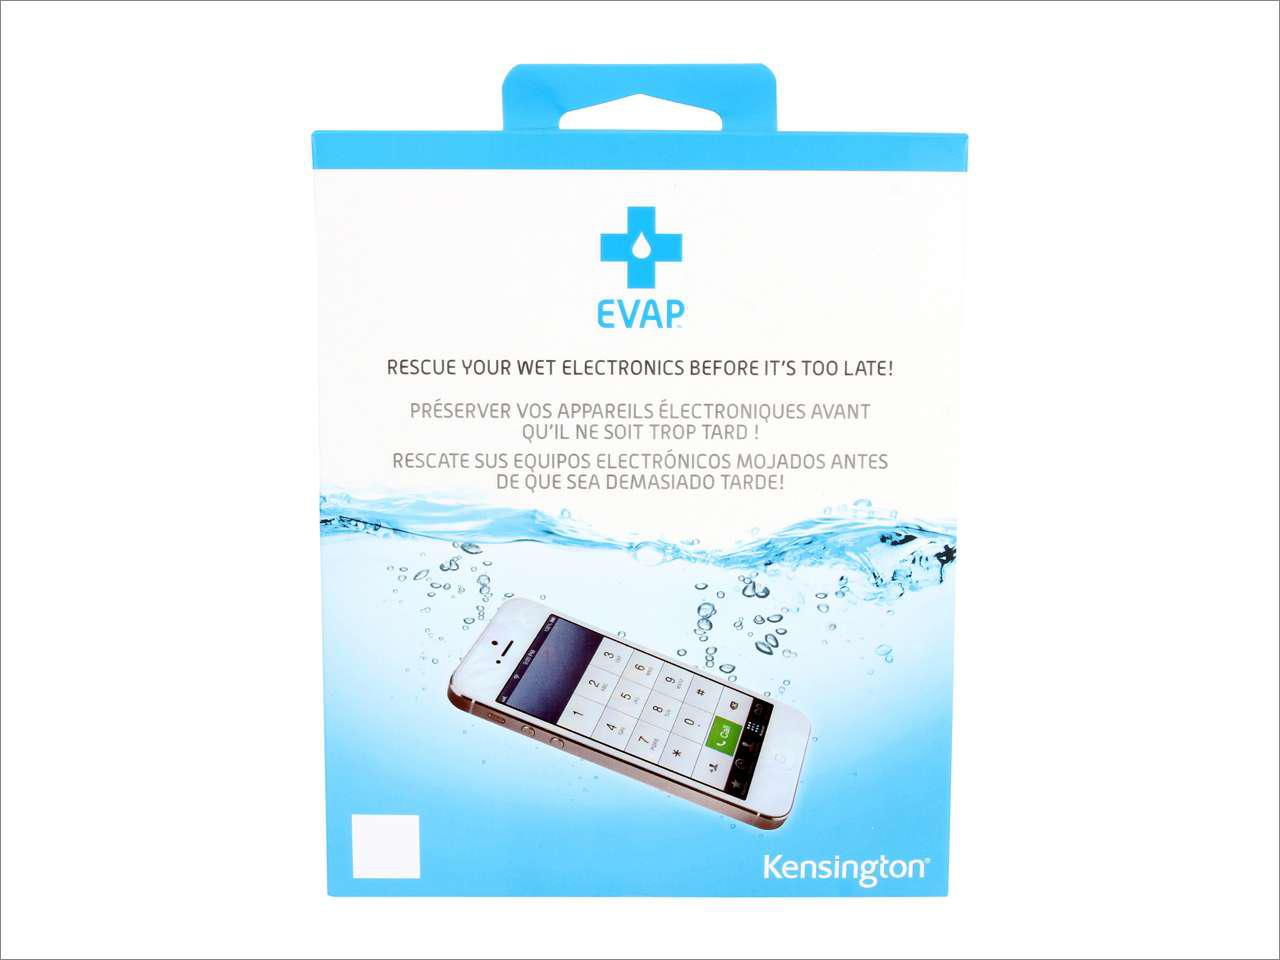 Набор для удаления влаги Kensington EVAP Water Rescue Kit (K39723AM) EAN/UPC: 85896397236